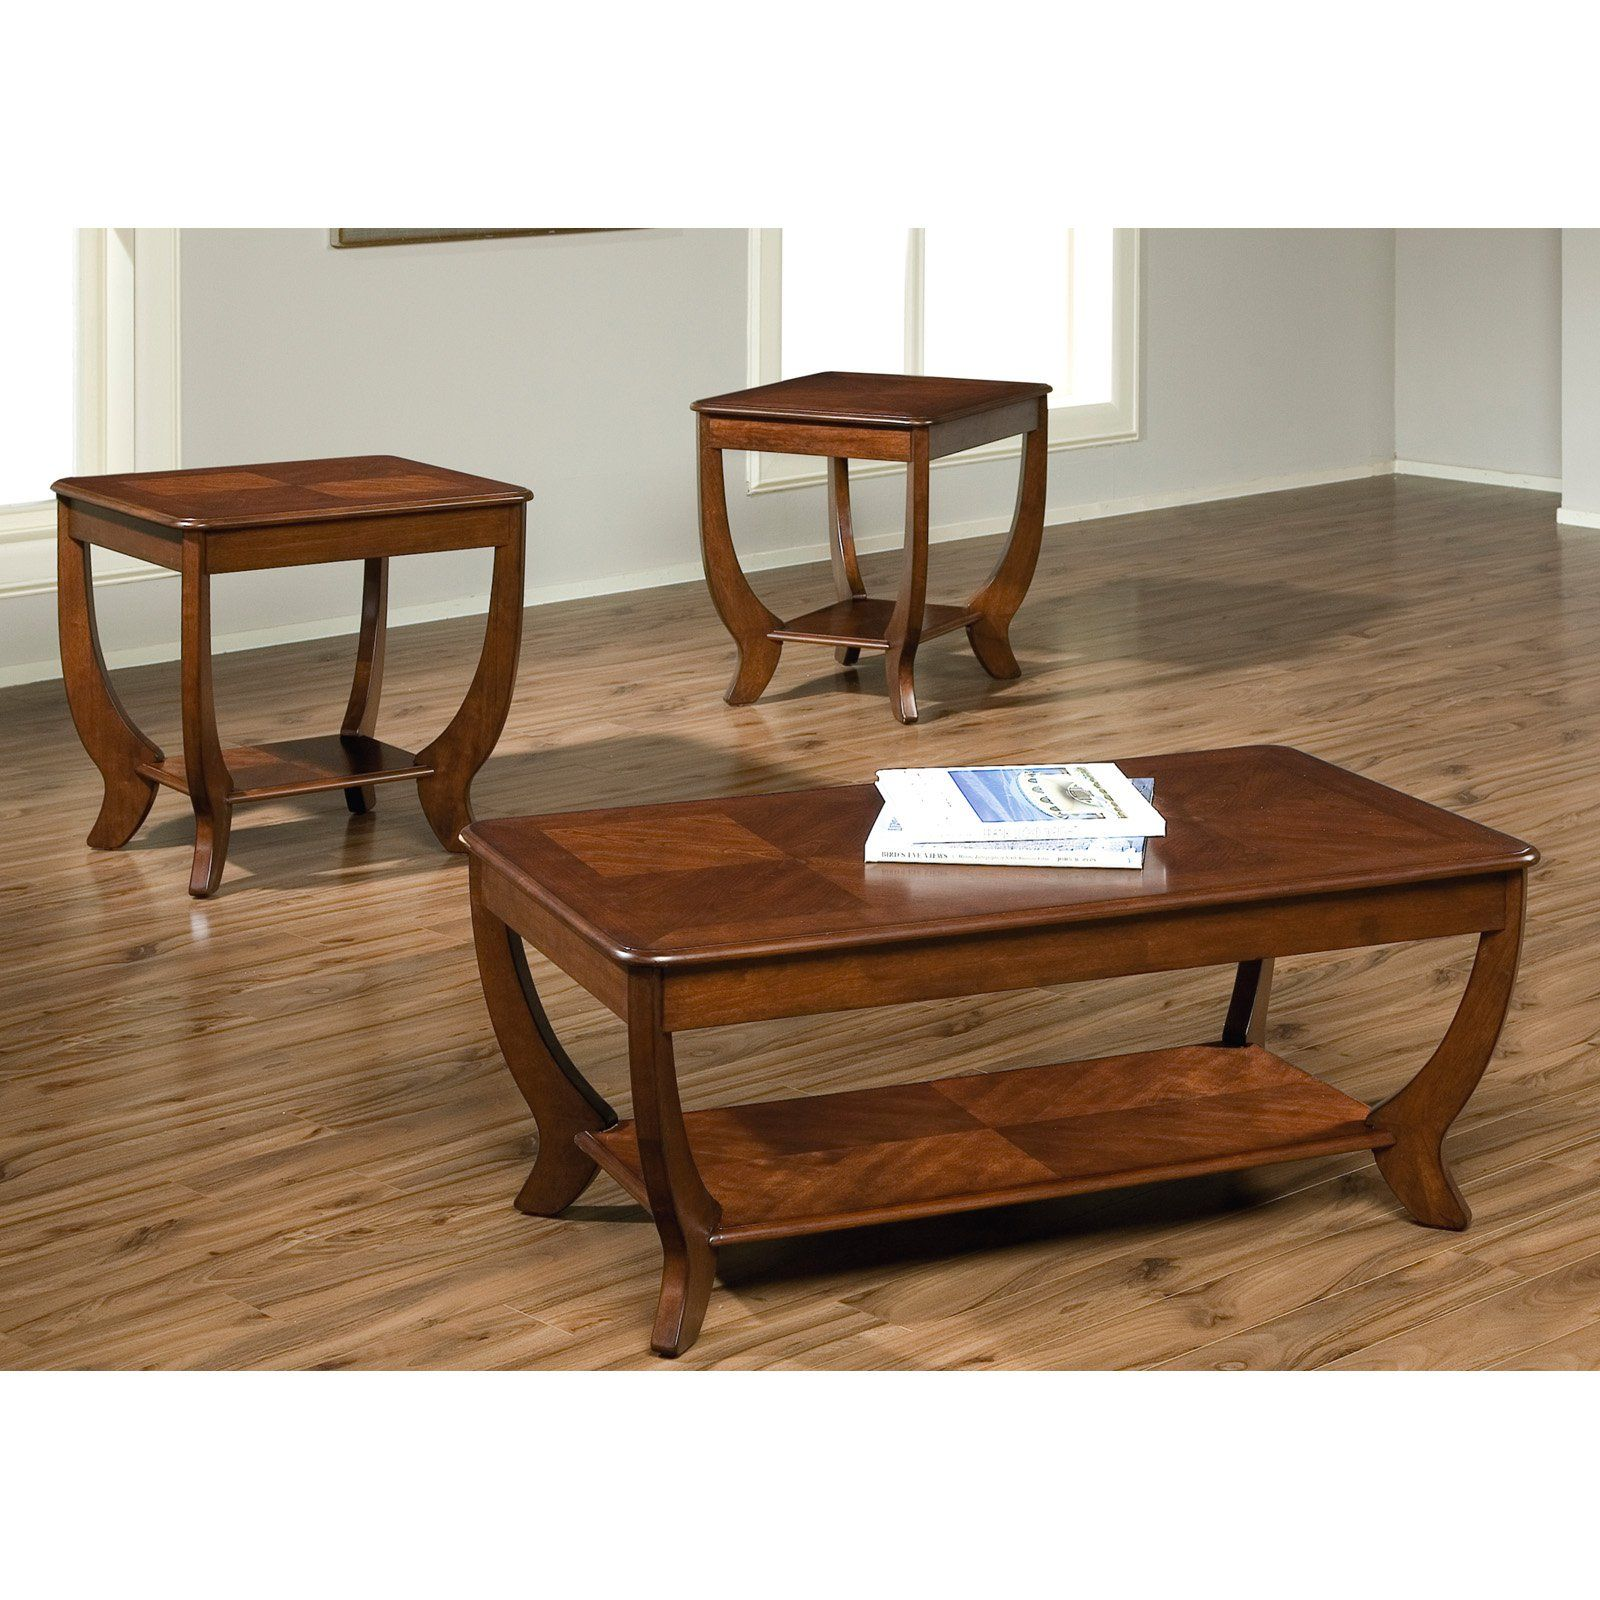 Cherryville 3 Piece Rectangular Coffee Table Set Autumn Blush 236 Ot3000 Home Furniture